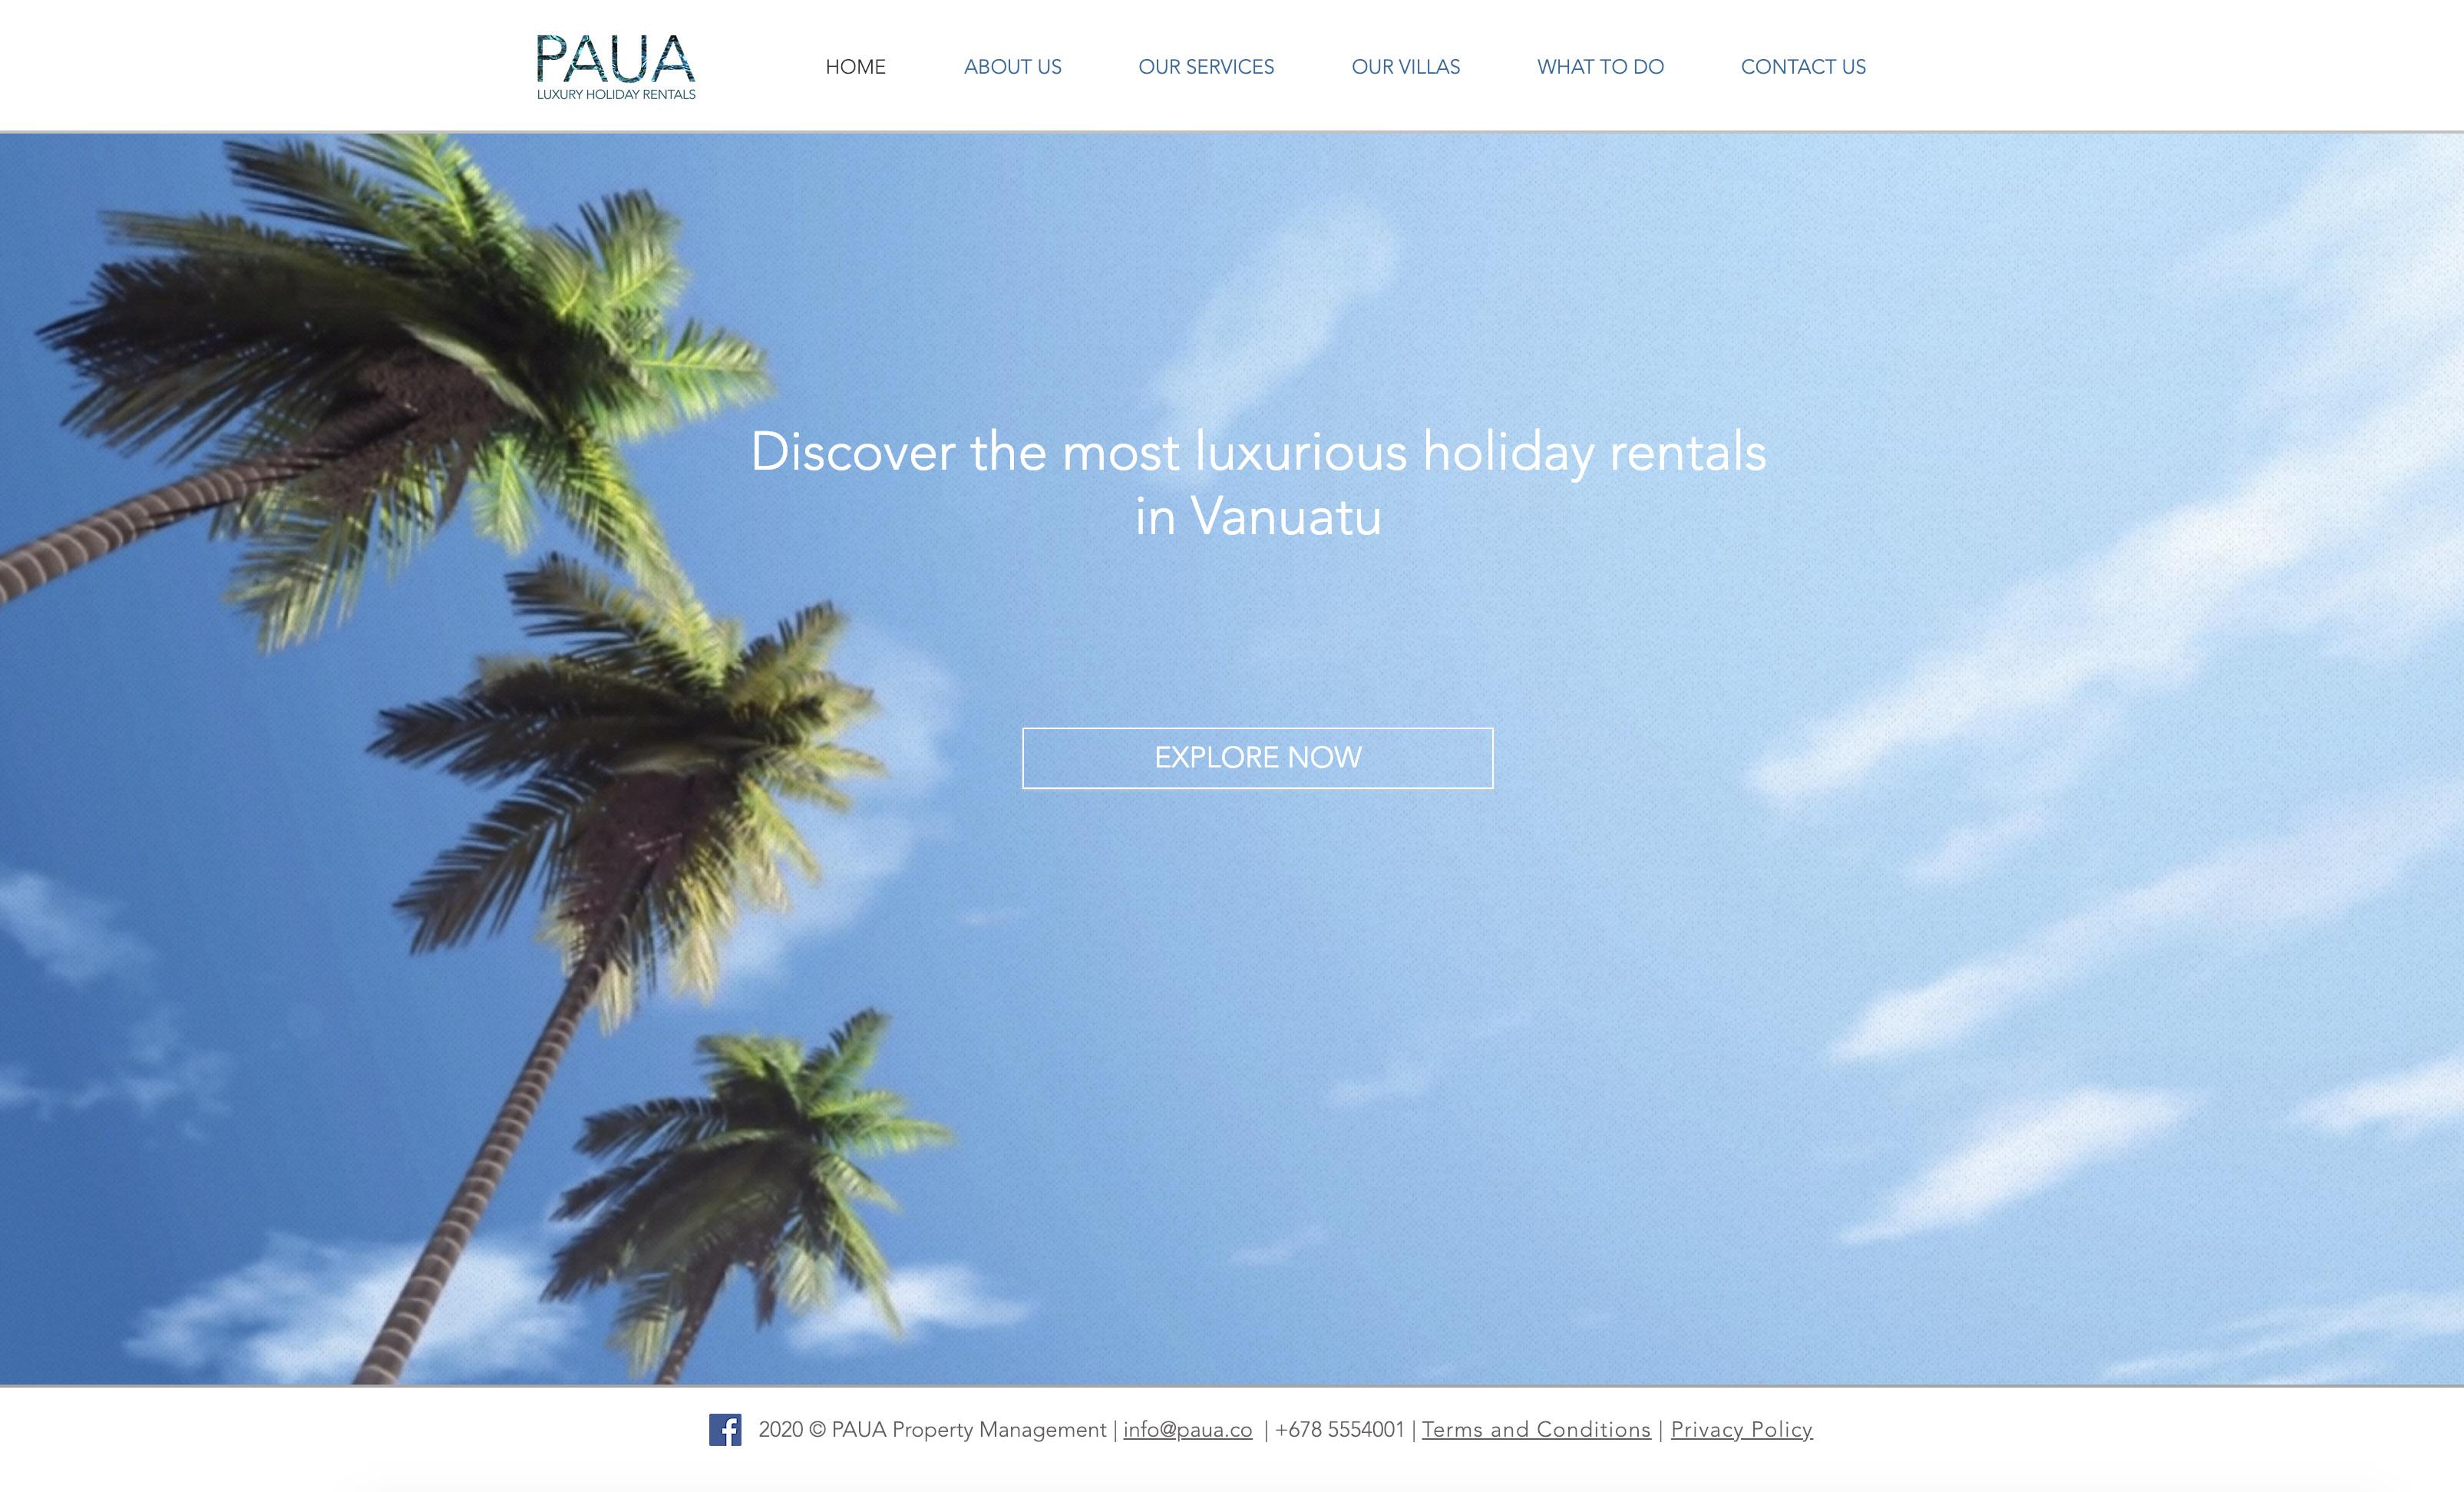 PAUA Luxury Holiday Rentals   Home